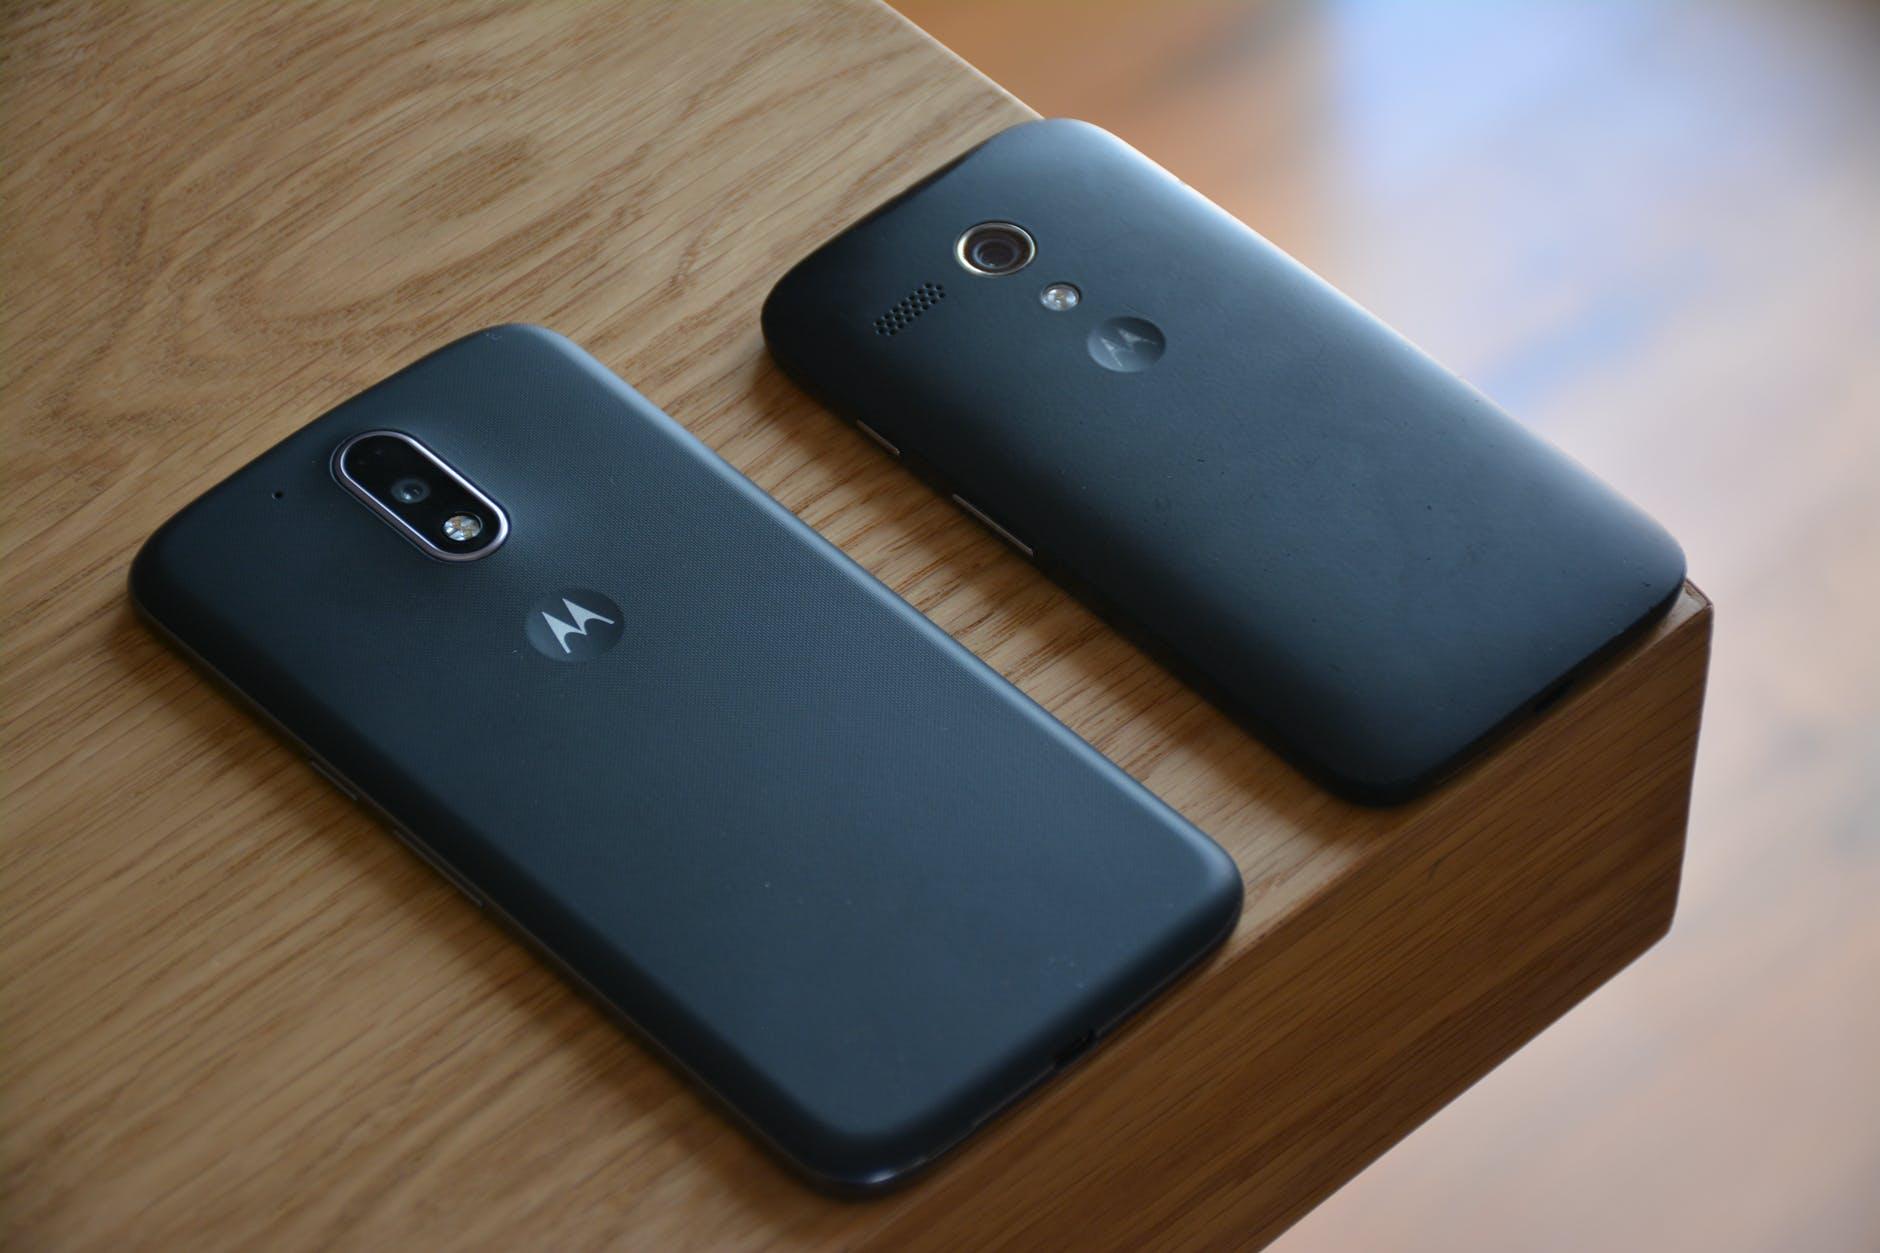 black motorola android smartphone